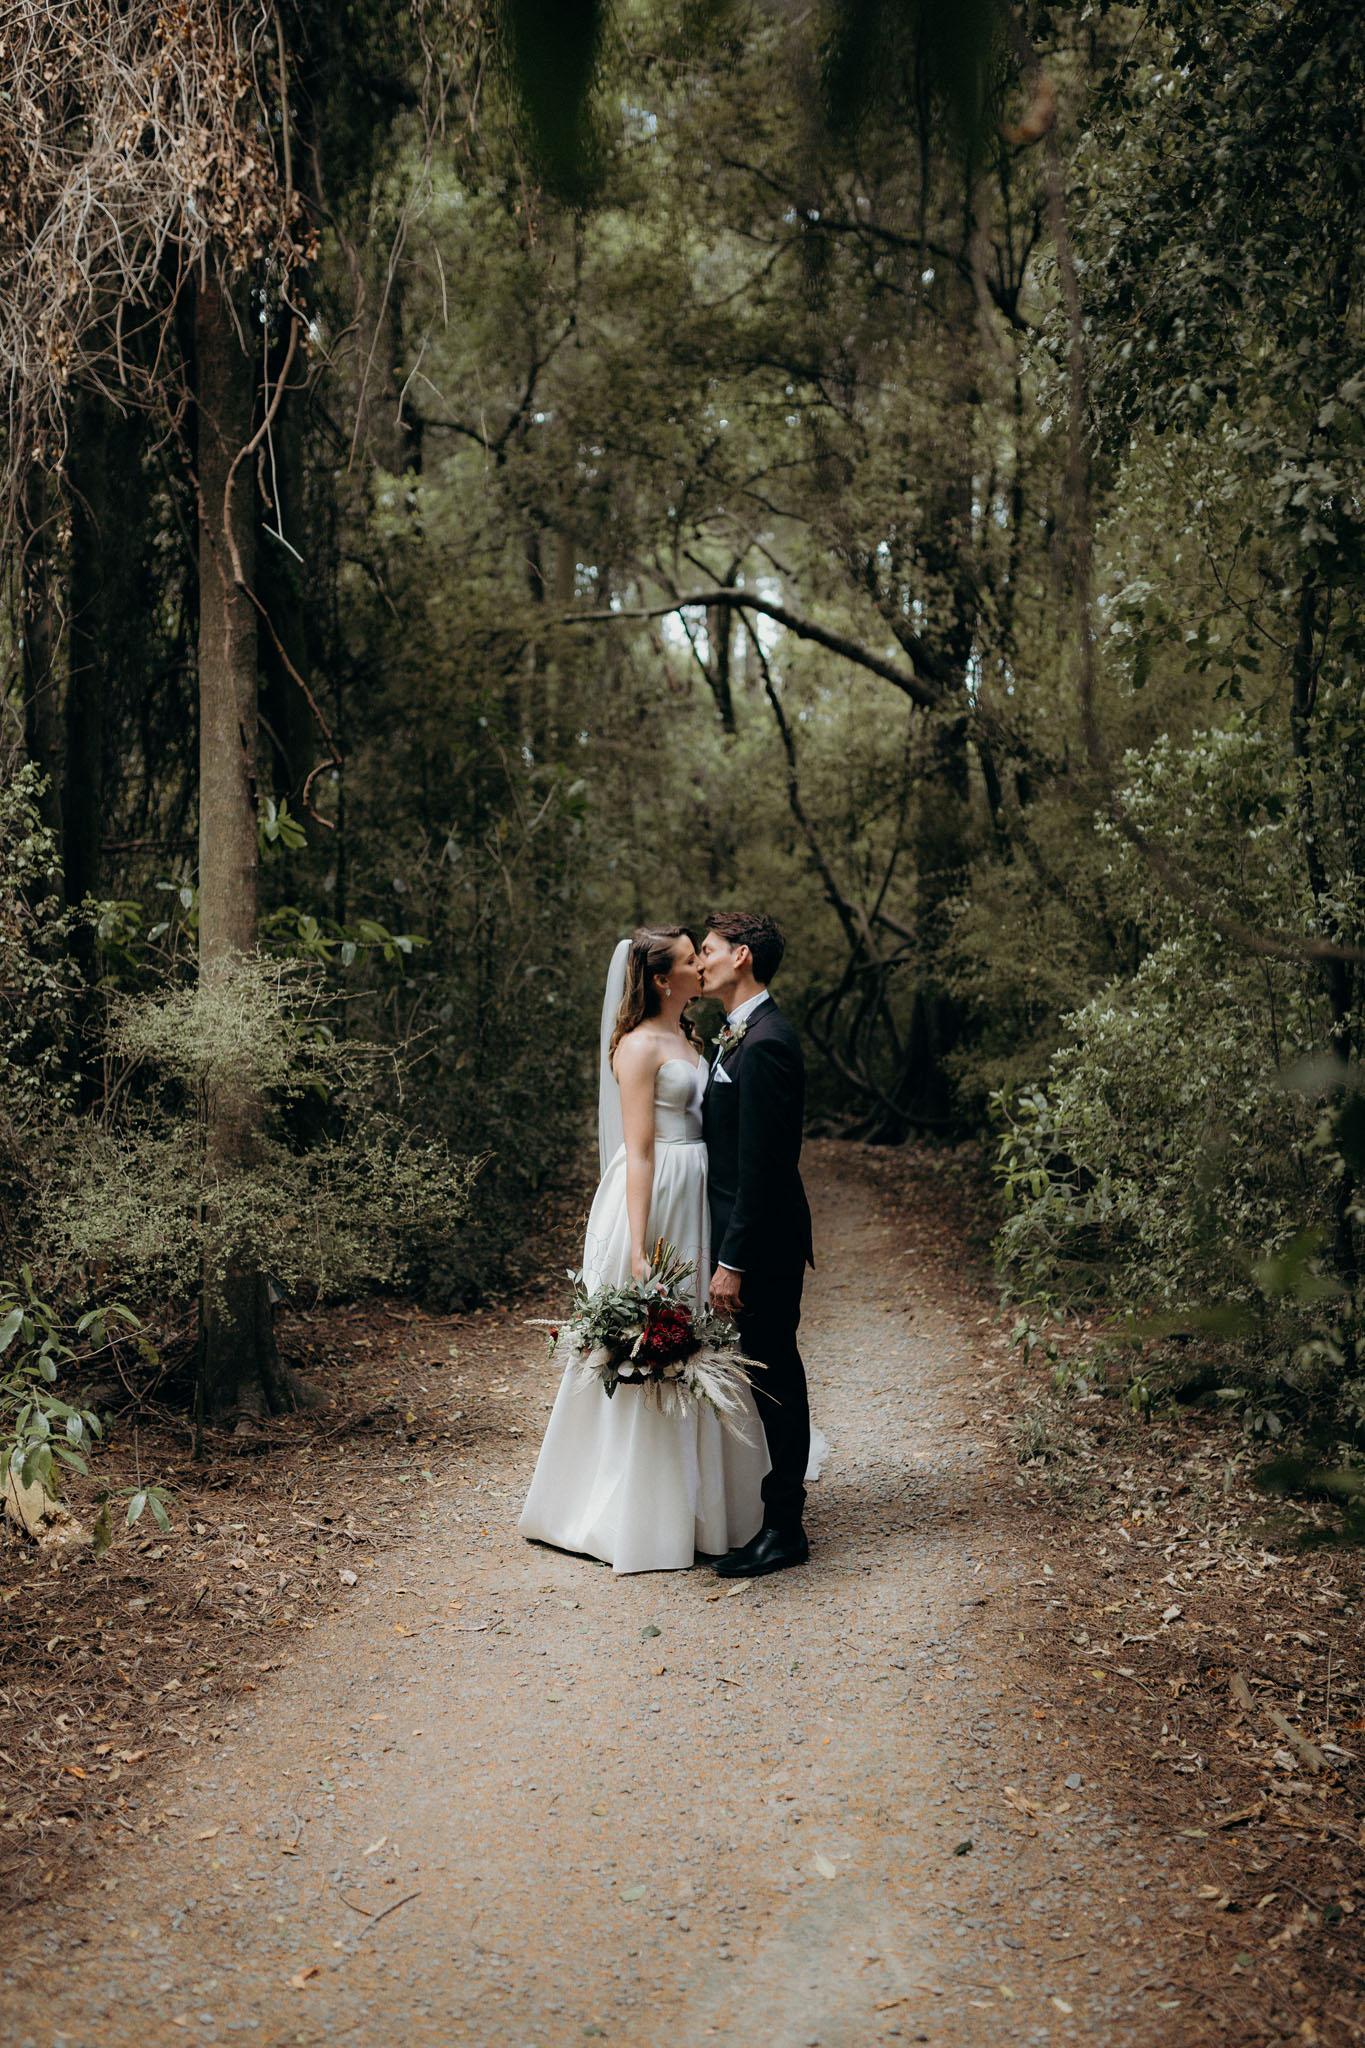 Jesse and Jessie Weddings Christchurch New Zealand wedding photographer